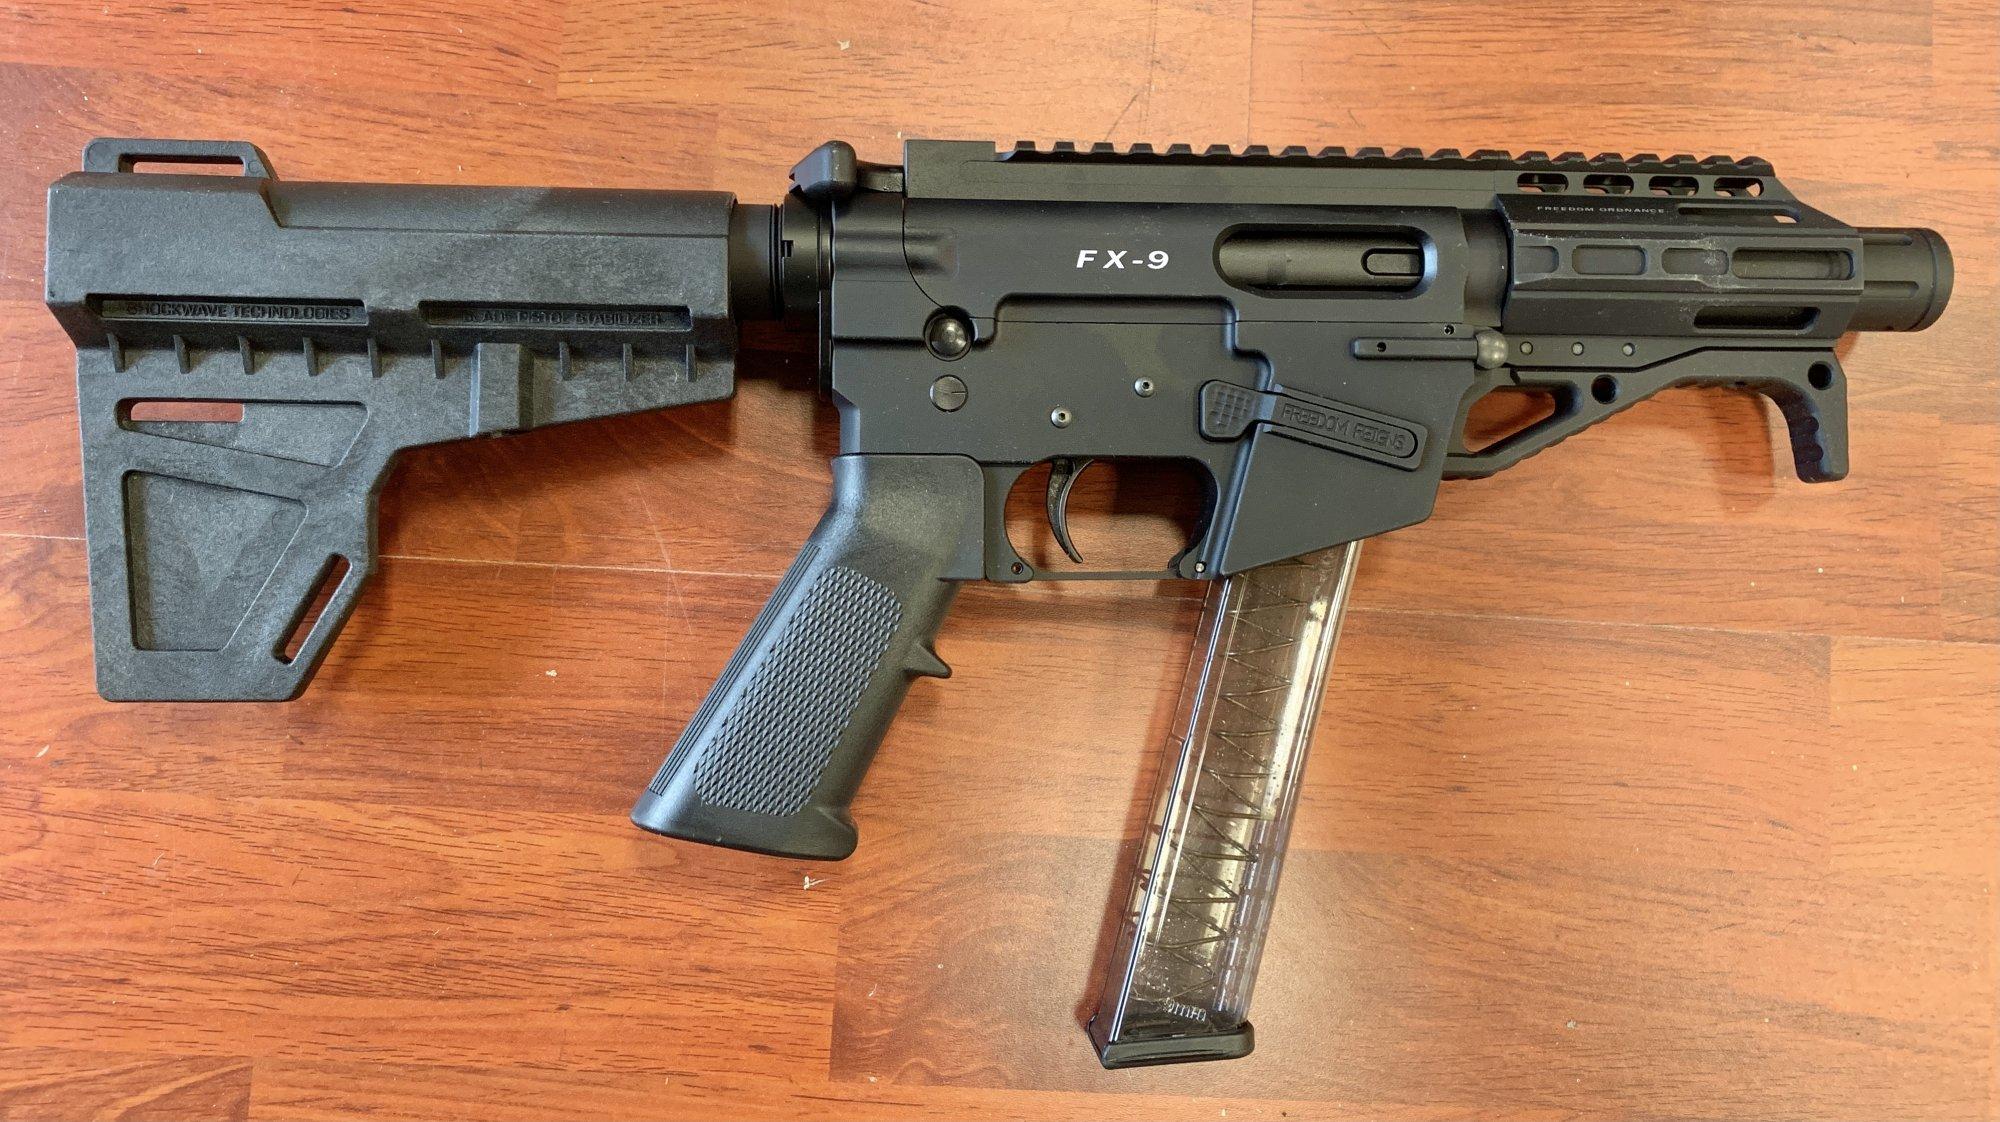 Freedom Ordnance FX-9 Tactical Pistol w/ Brace